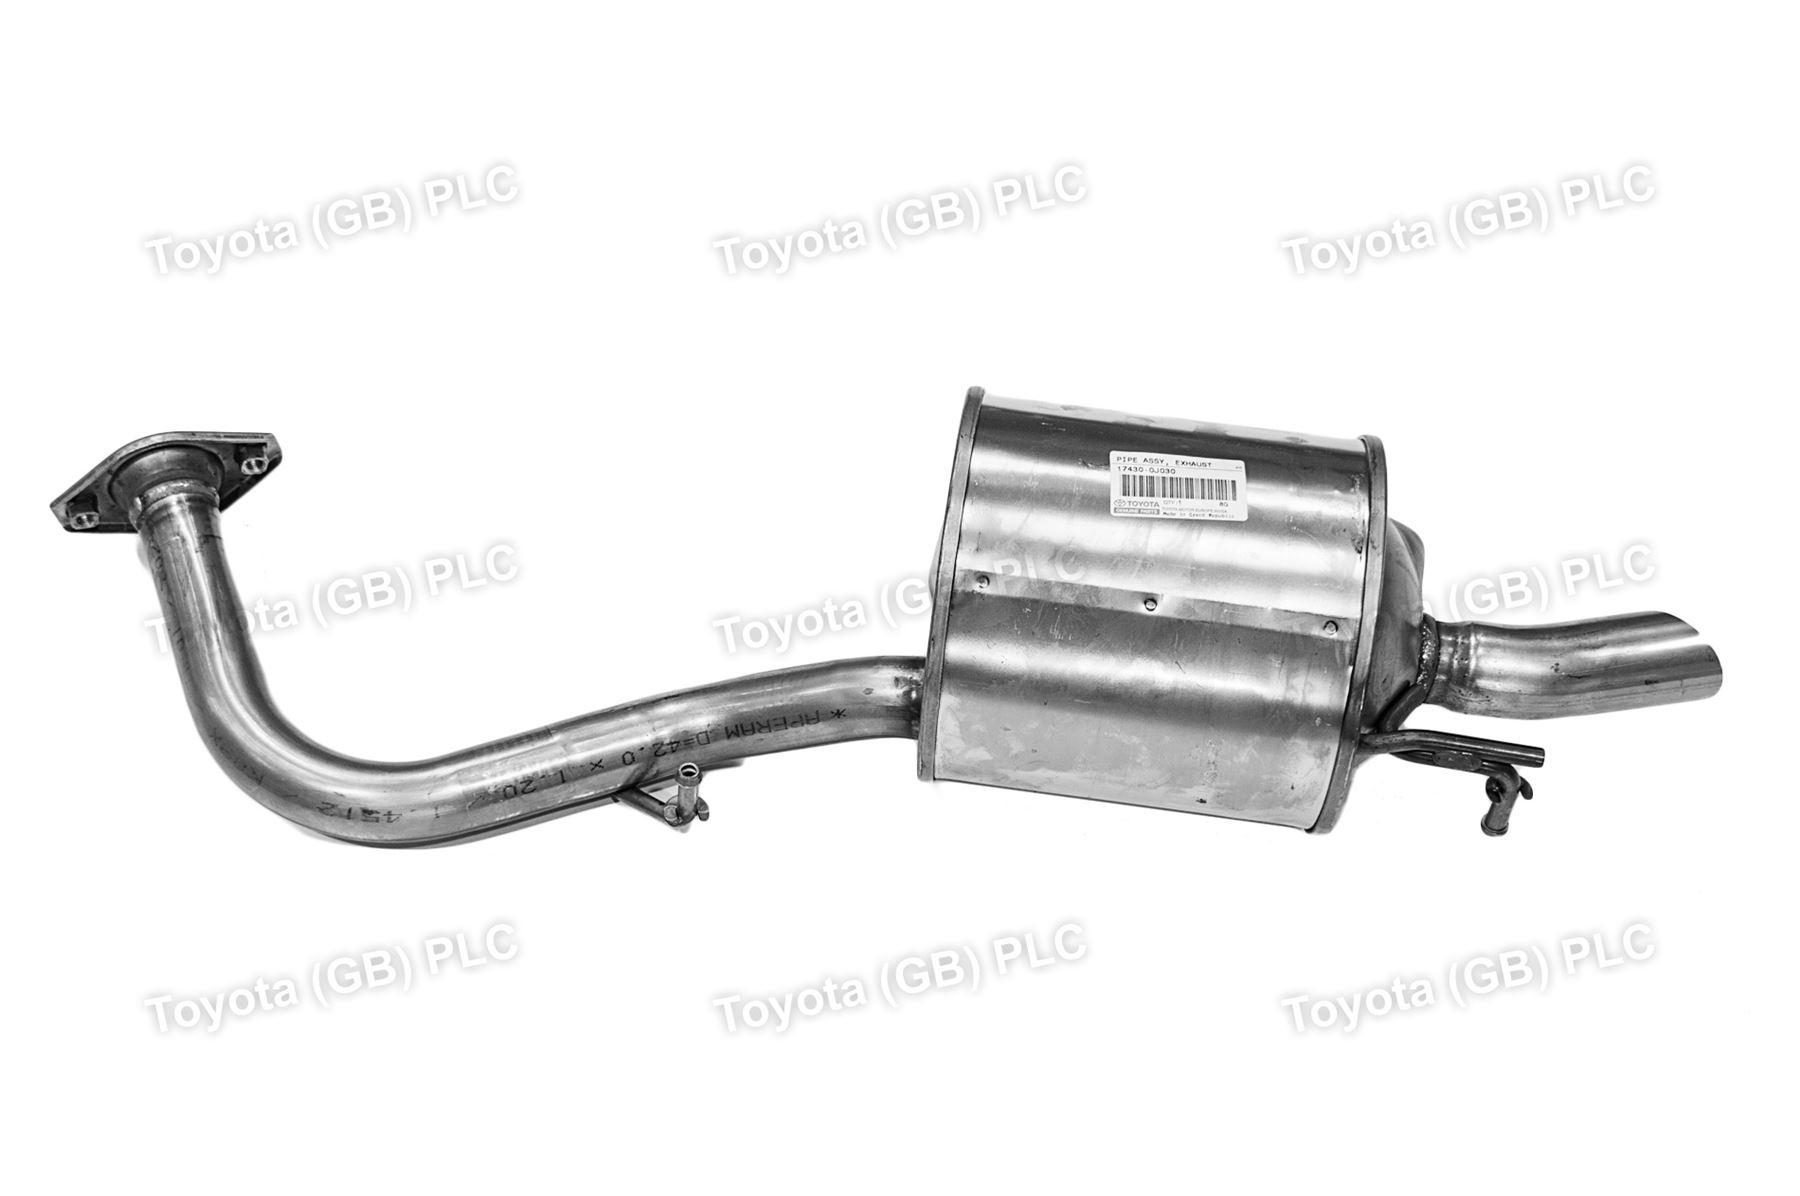 toyota yaris trd exhaust fitur keamanan grand new avanza genuine 1 3 pipe 174300j030 ebay